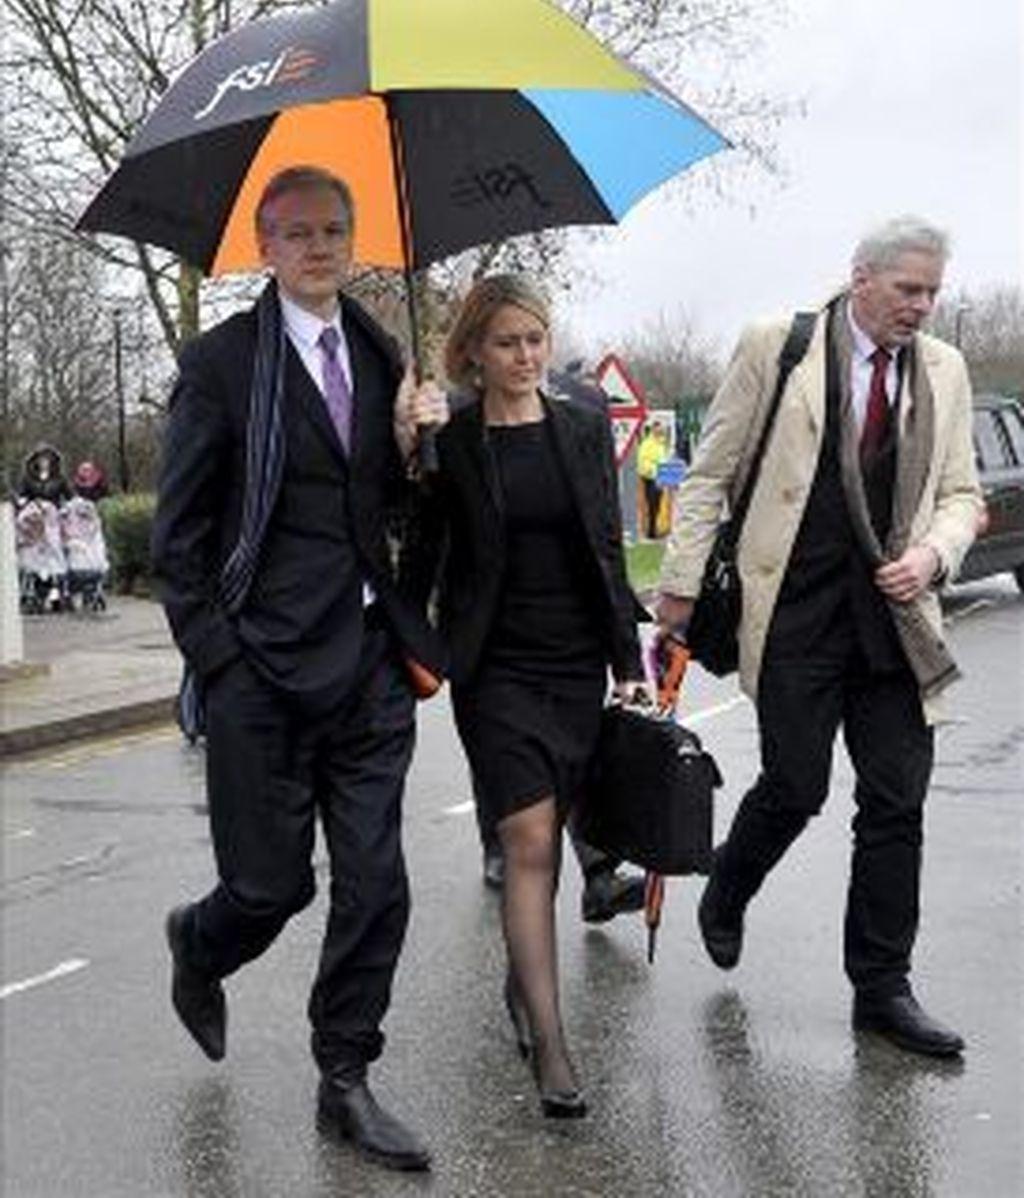 El fundador de Wikileaks, Julian Assange (i), acompañado por la abogada Jennifer Robinson y el portavoz de Wikileaks, Kristinn Hrafnsson. Foto: archivo EFE